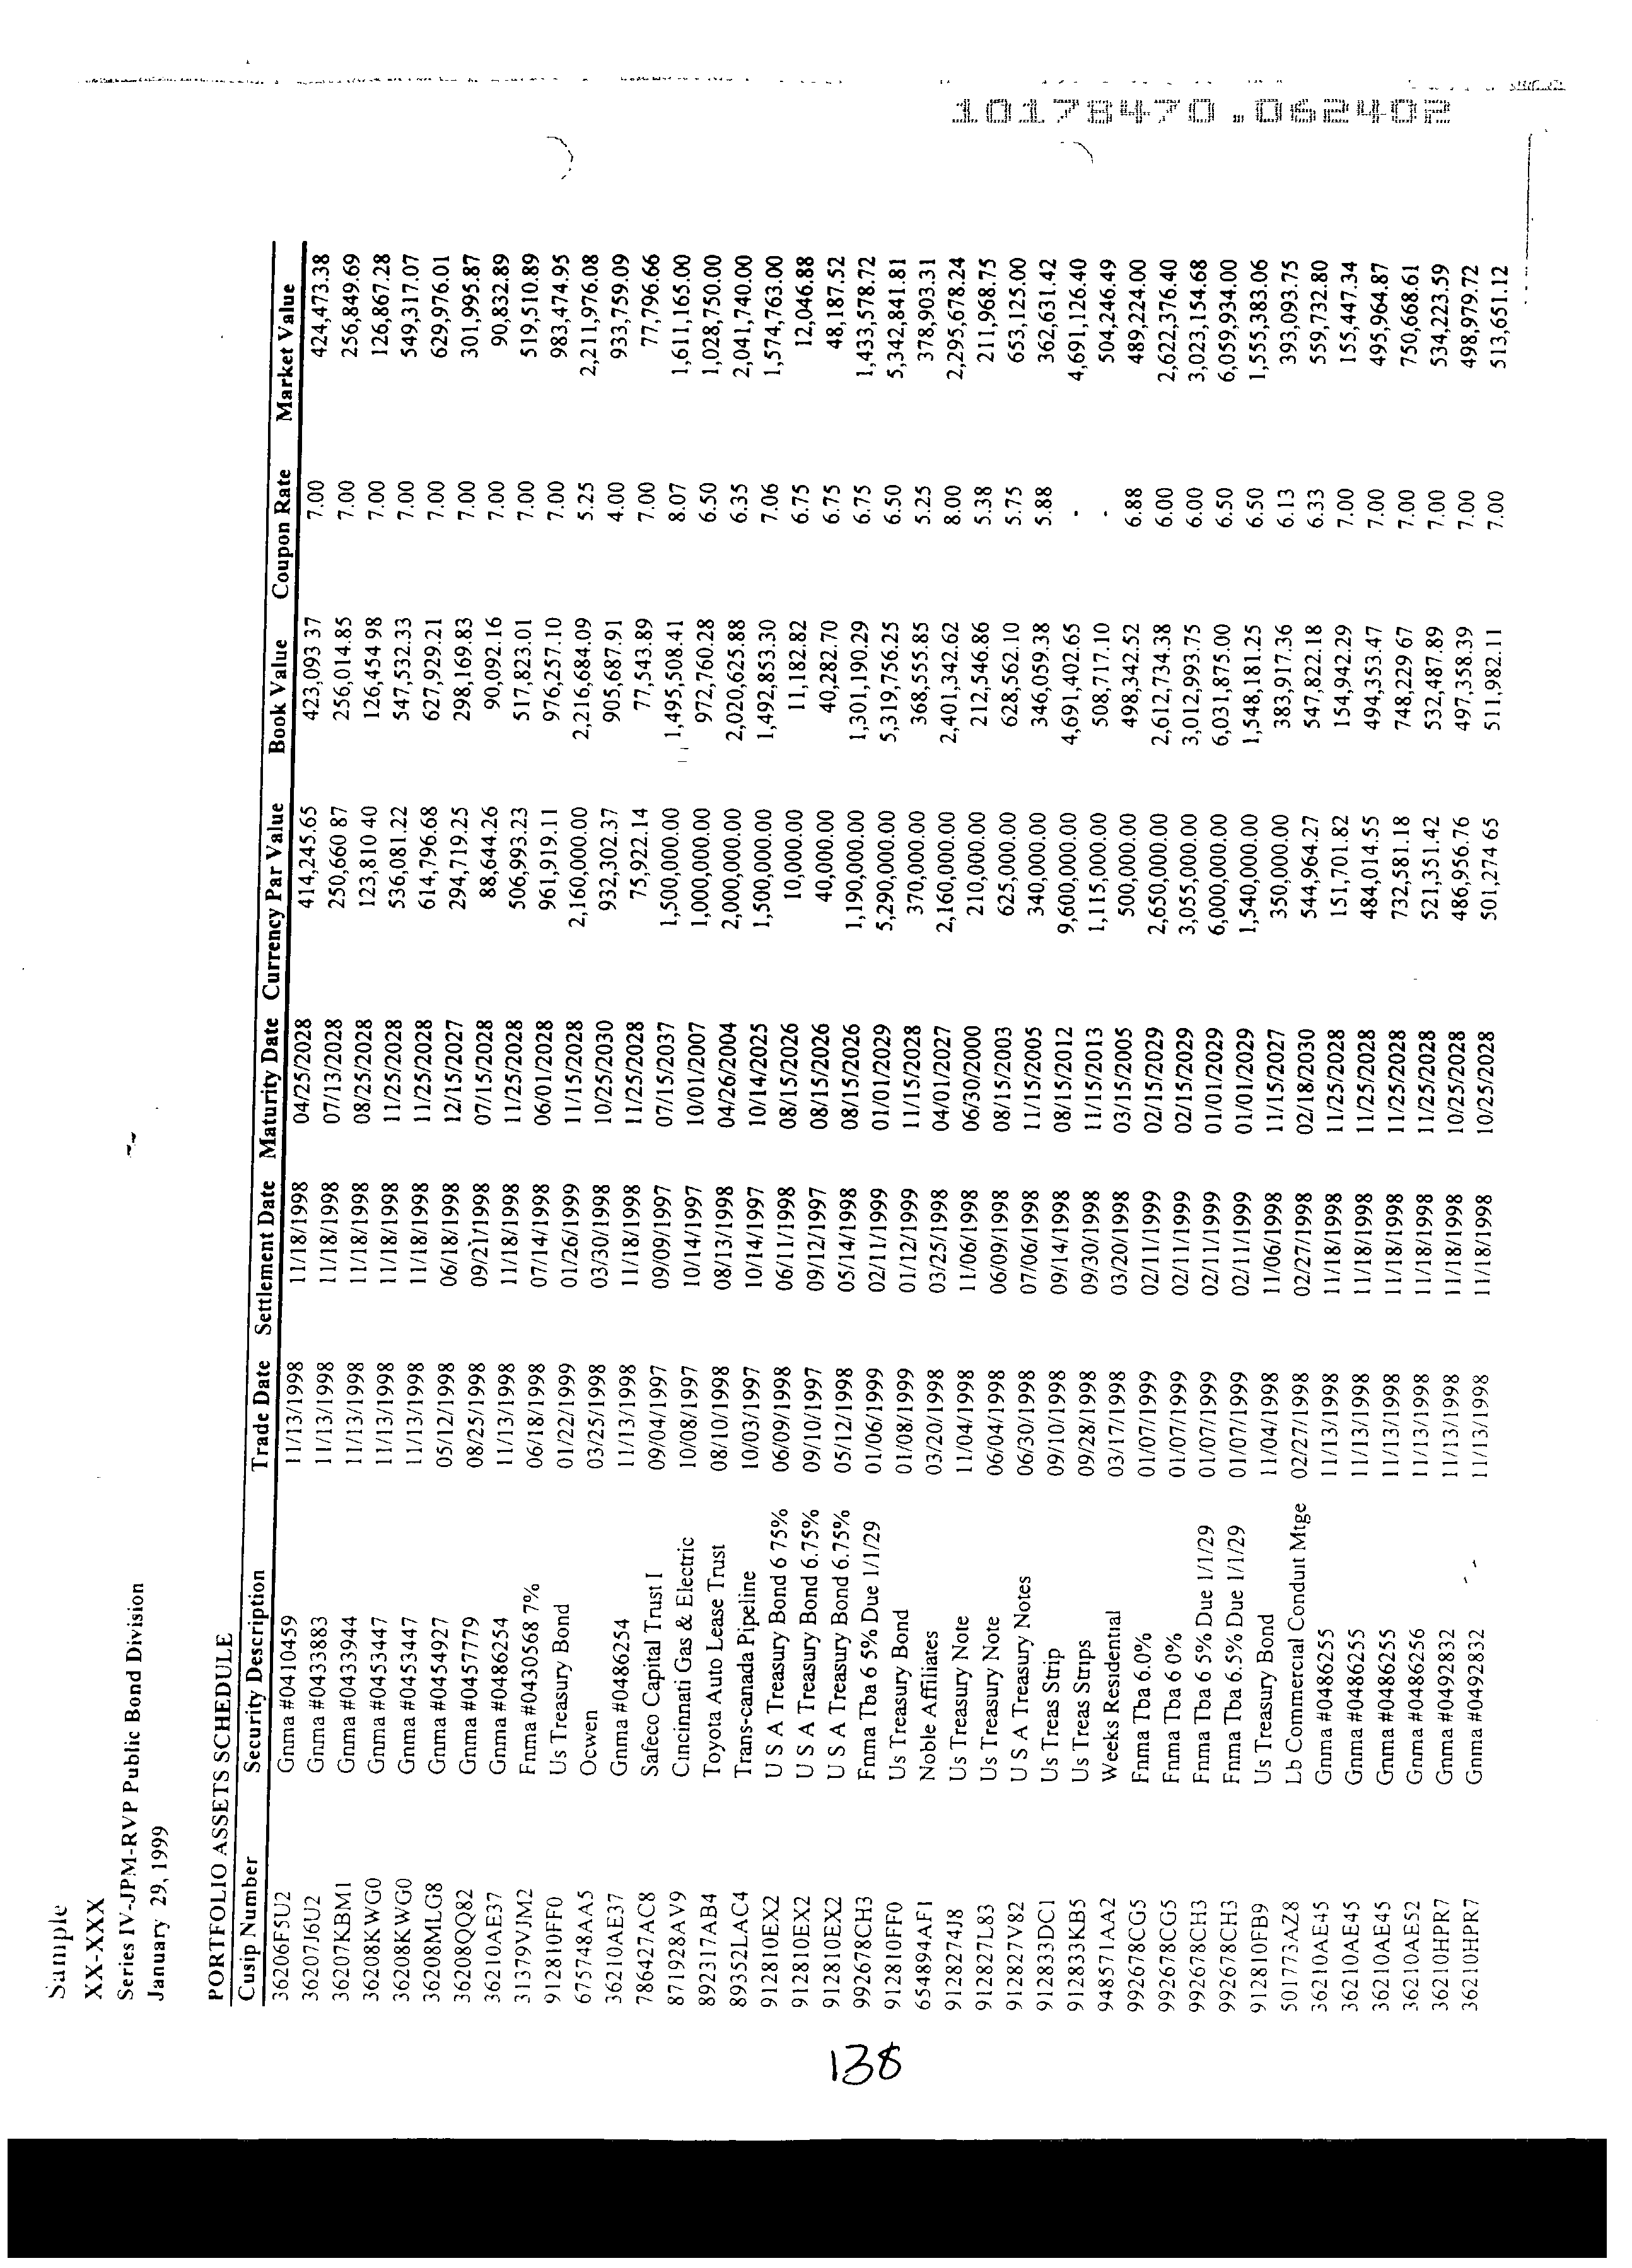 Figure US20030078815A1-20030424-P00028